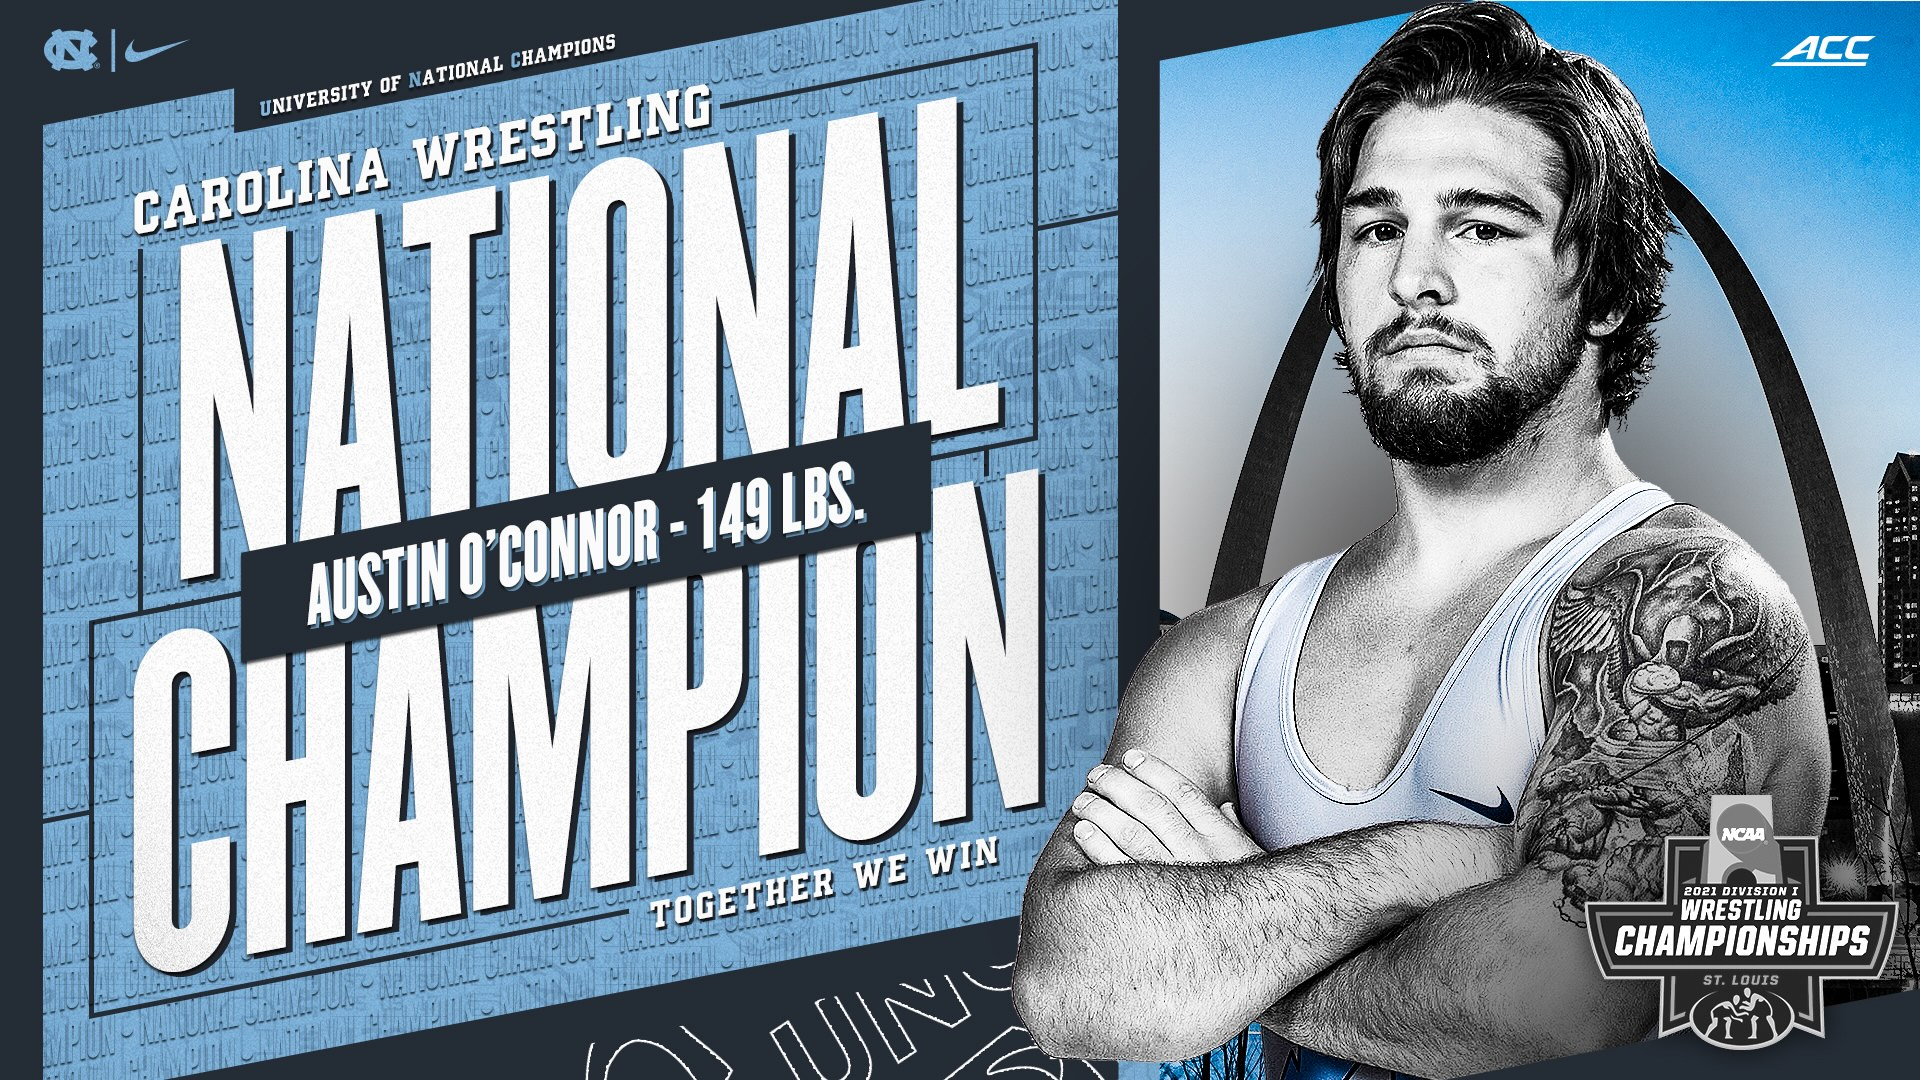 Carolina wrestling National Champion: Austin O'Connor.